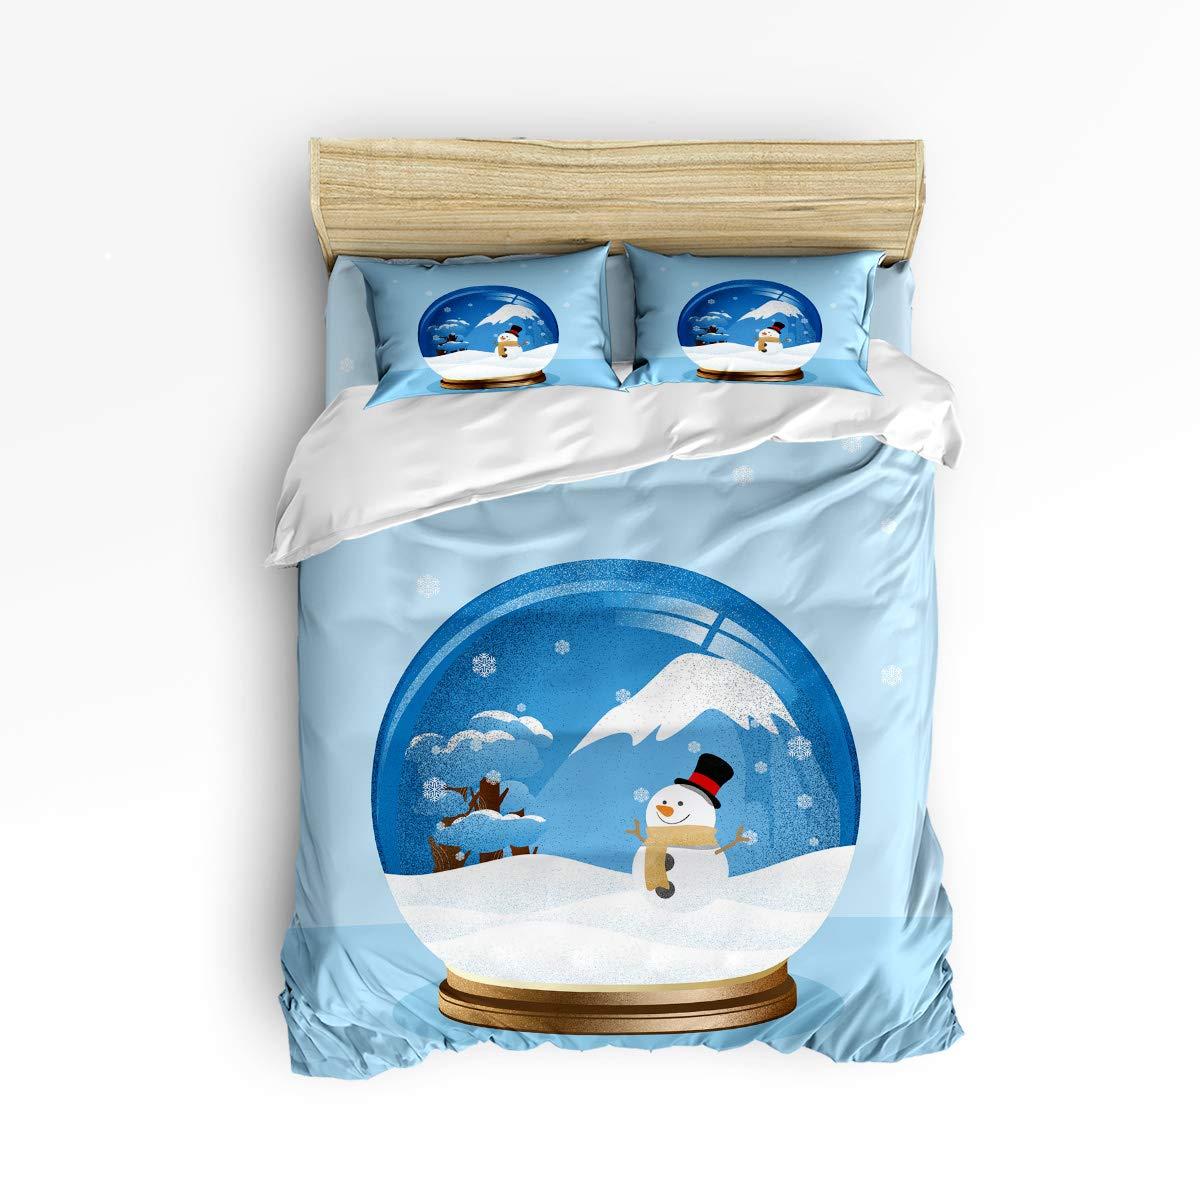 Anzona 寝具4点セット 雪だるまの雪だるまの木 魔法のクリスタルボール柄イメージ 4ピース 羽毛布団カバーセット ベッドスプレッド デイベッド 子供/子供/ティーン/大人 Twin Size 181022-zly4pcsbeds-SWTQ00503SJTAAZN B07JQFCZ3M Snowman11azn6191 Twin Size